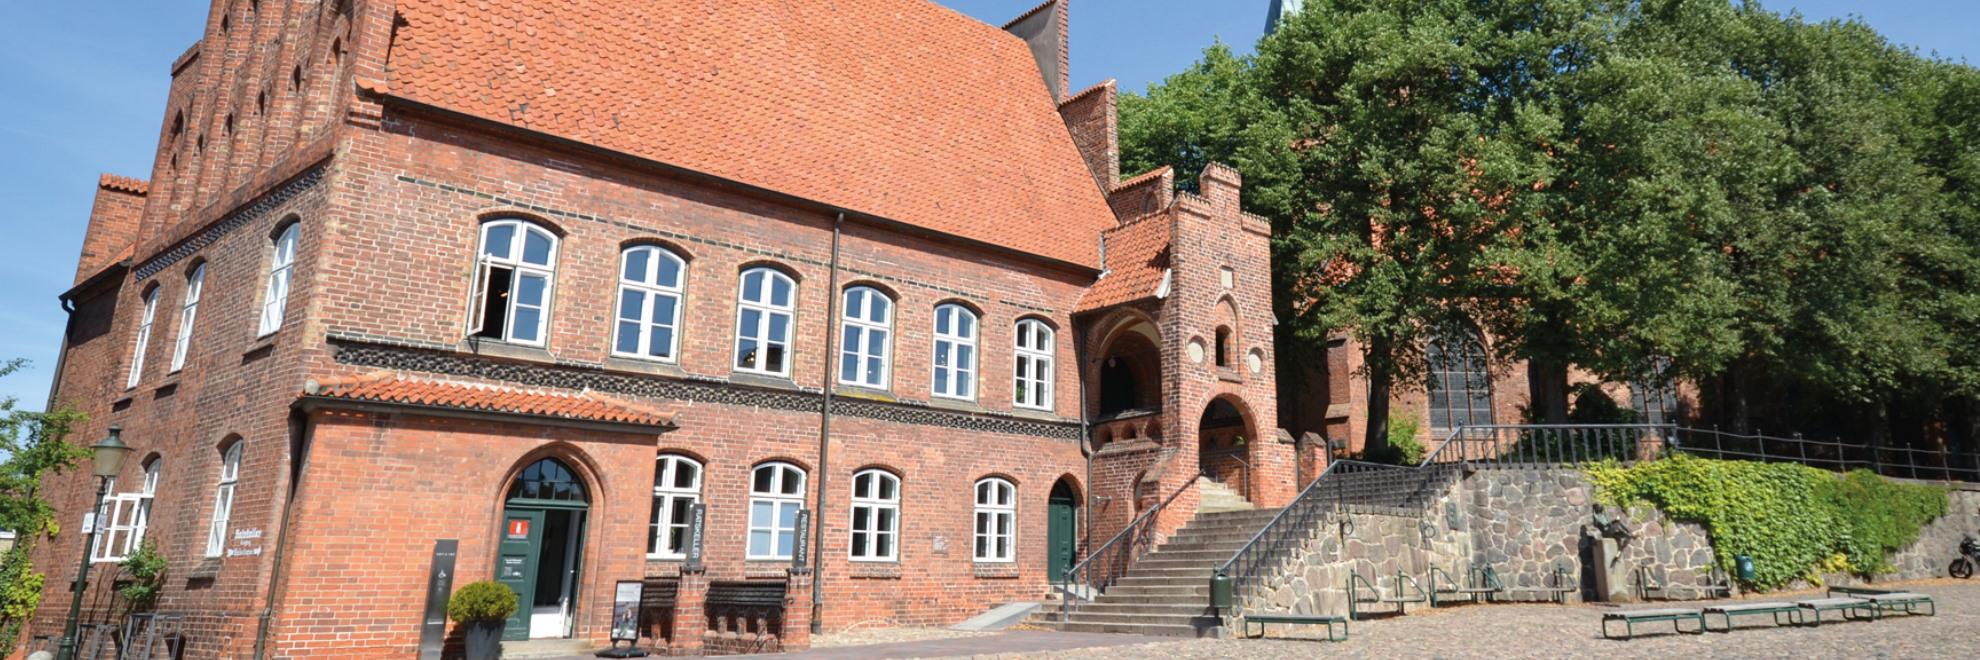 Moellner Museum